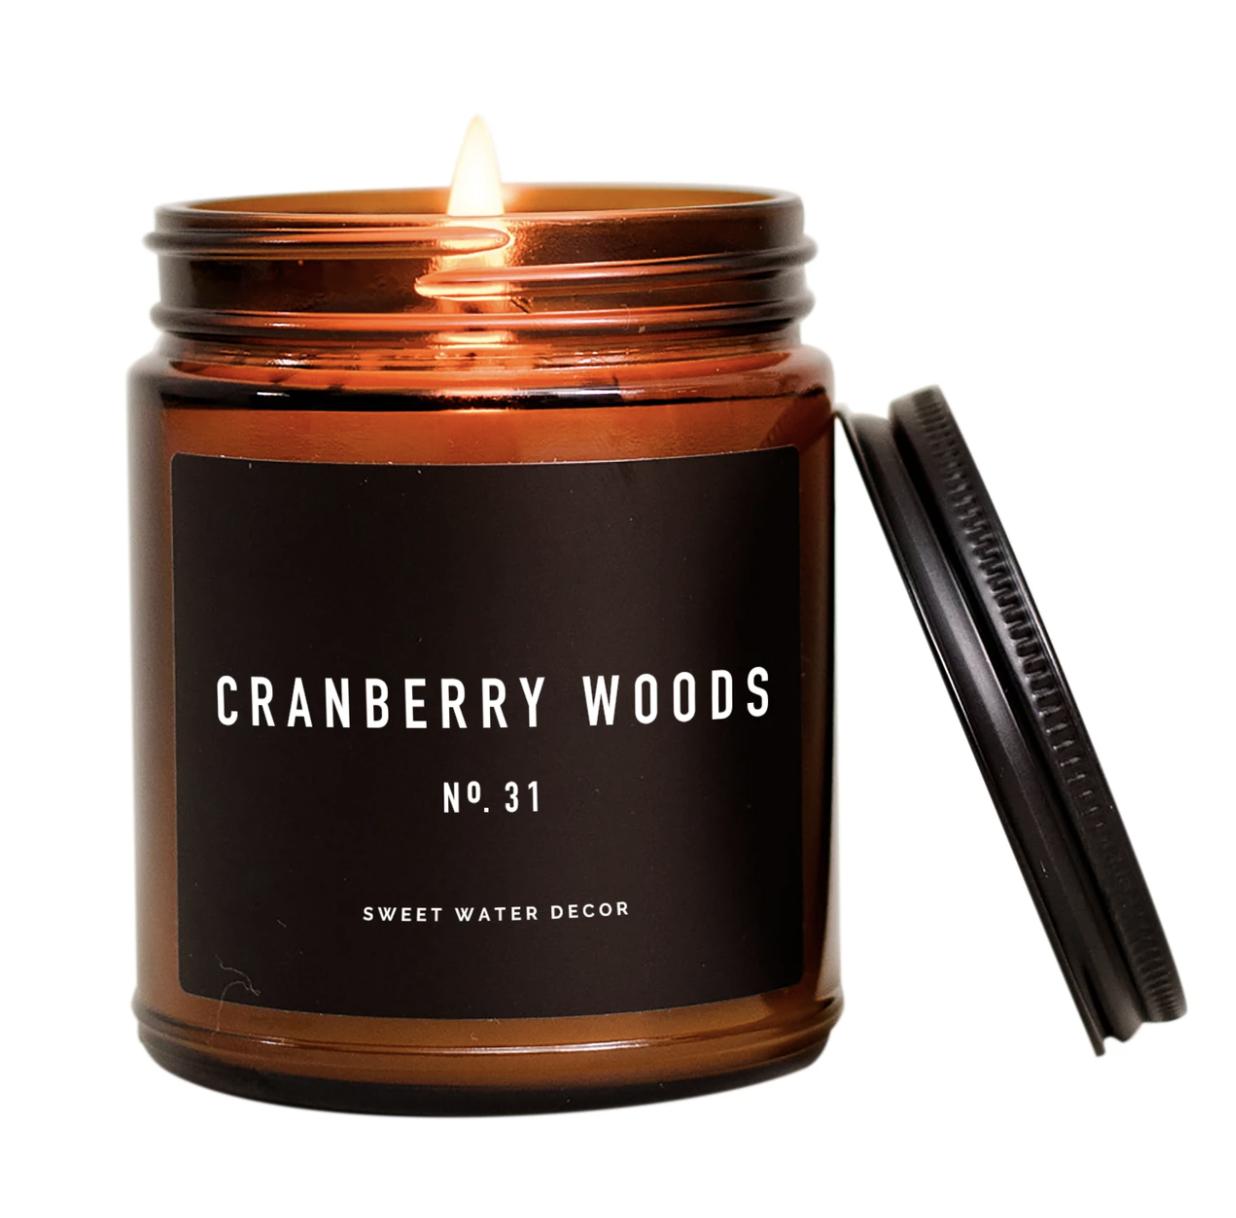 Cranberry Woods Candle Amber Jar